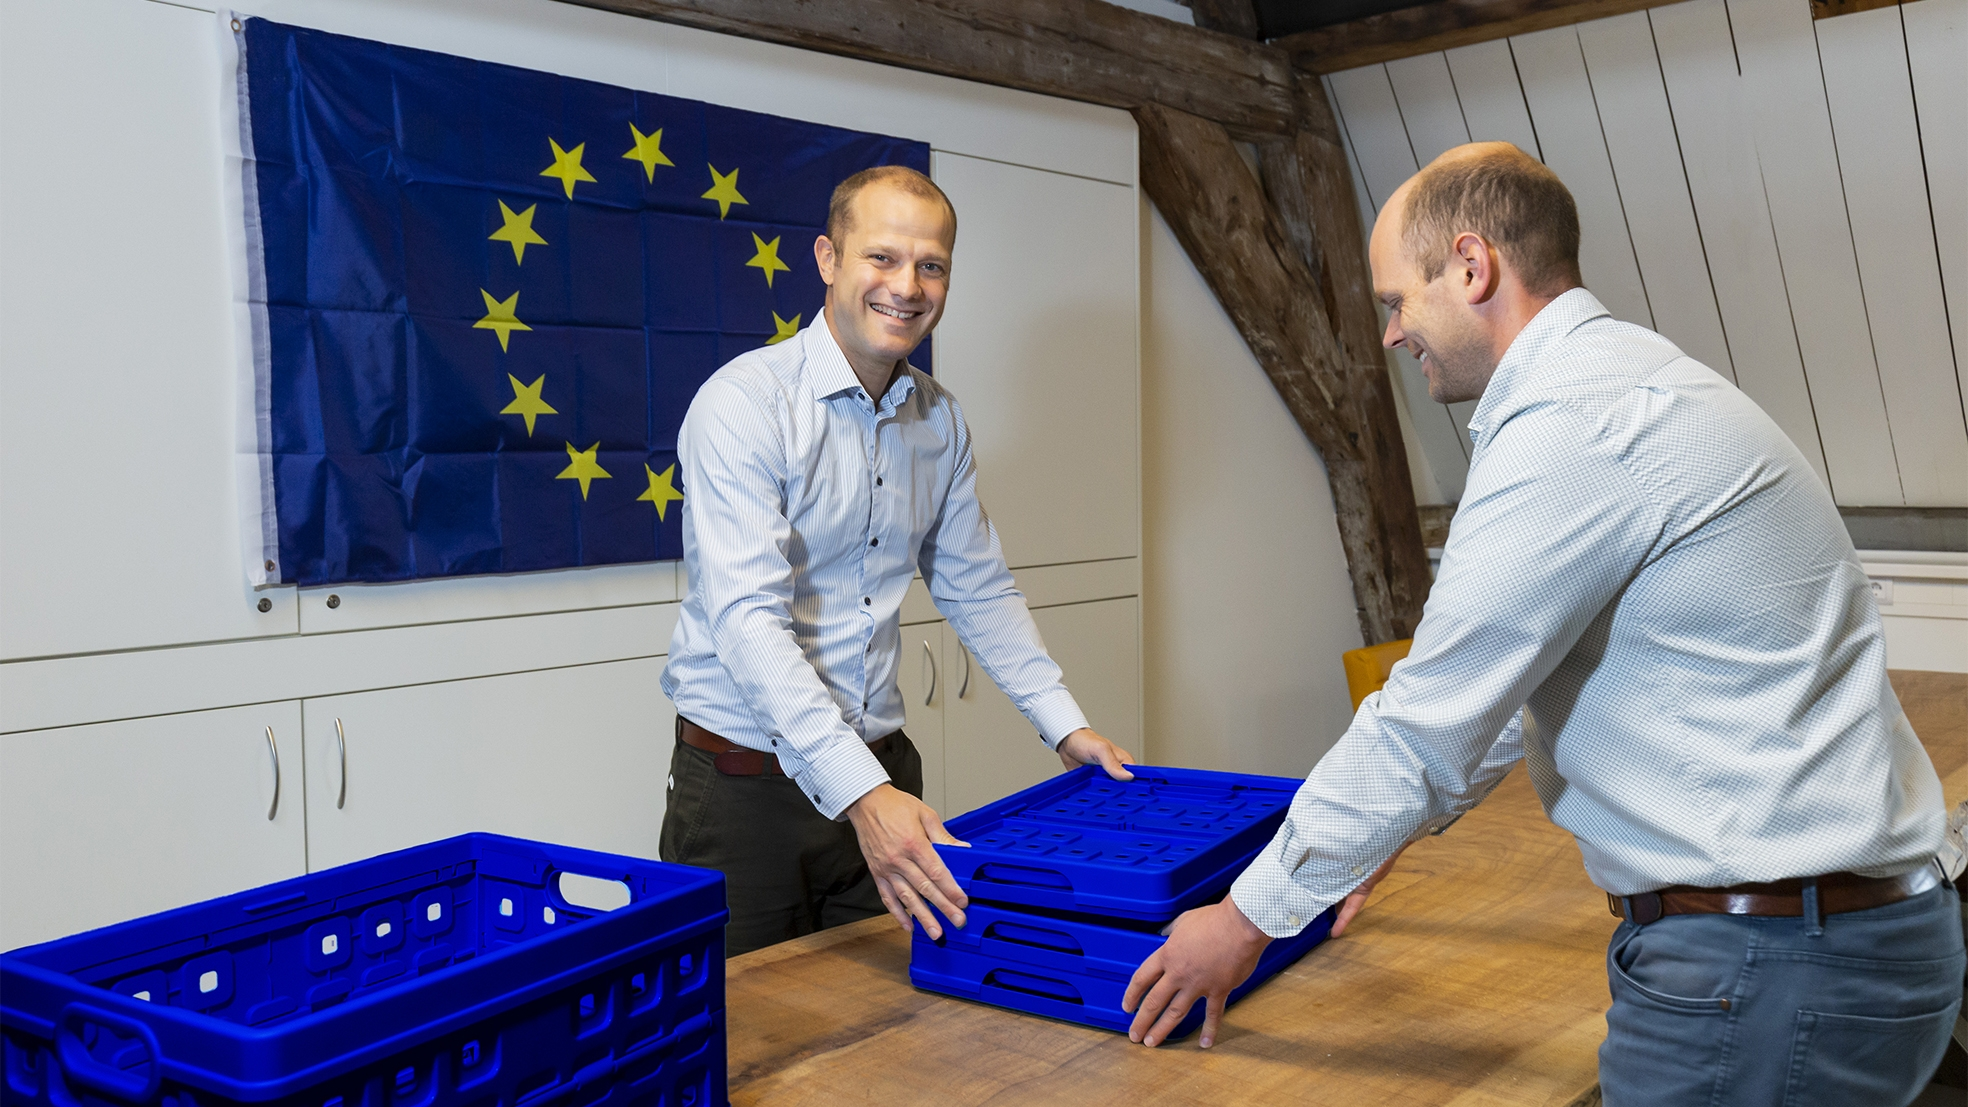 Enterprise Europe Network duo